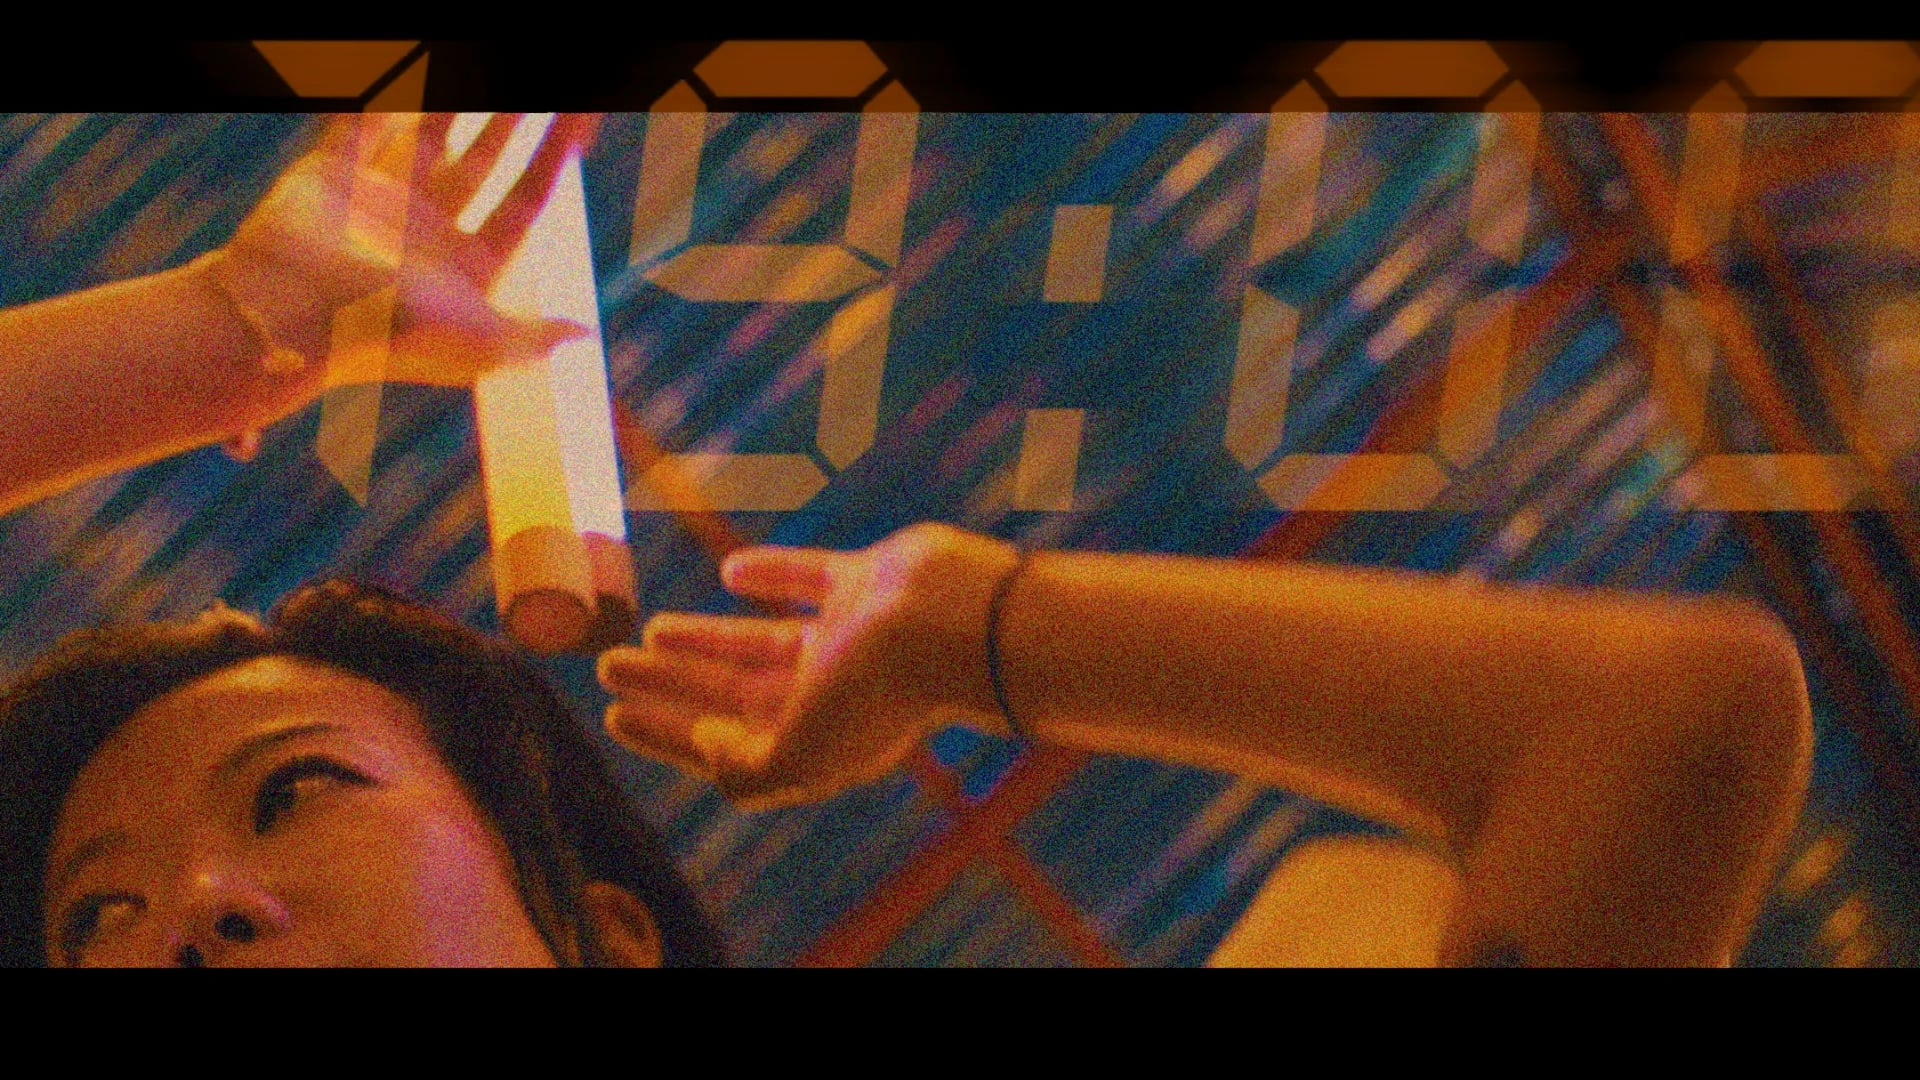 Estee Lauder - A Dream Lost In Time (Director)